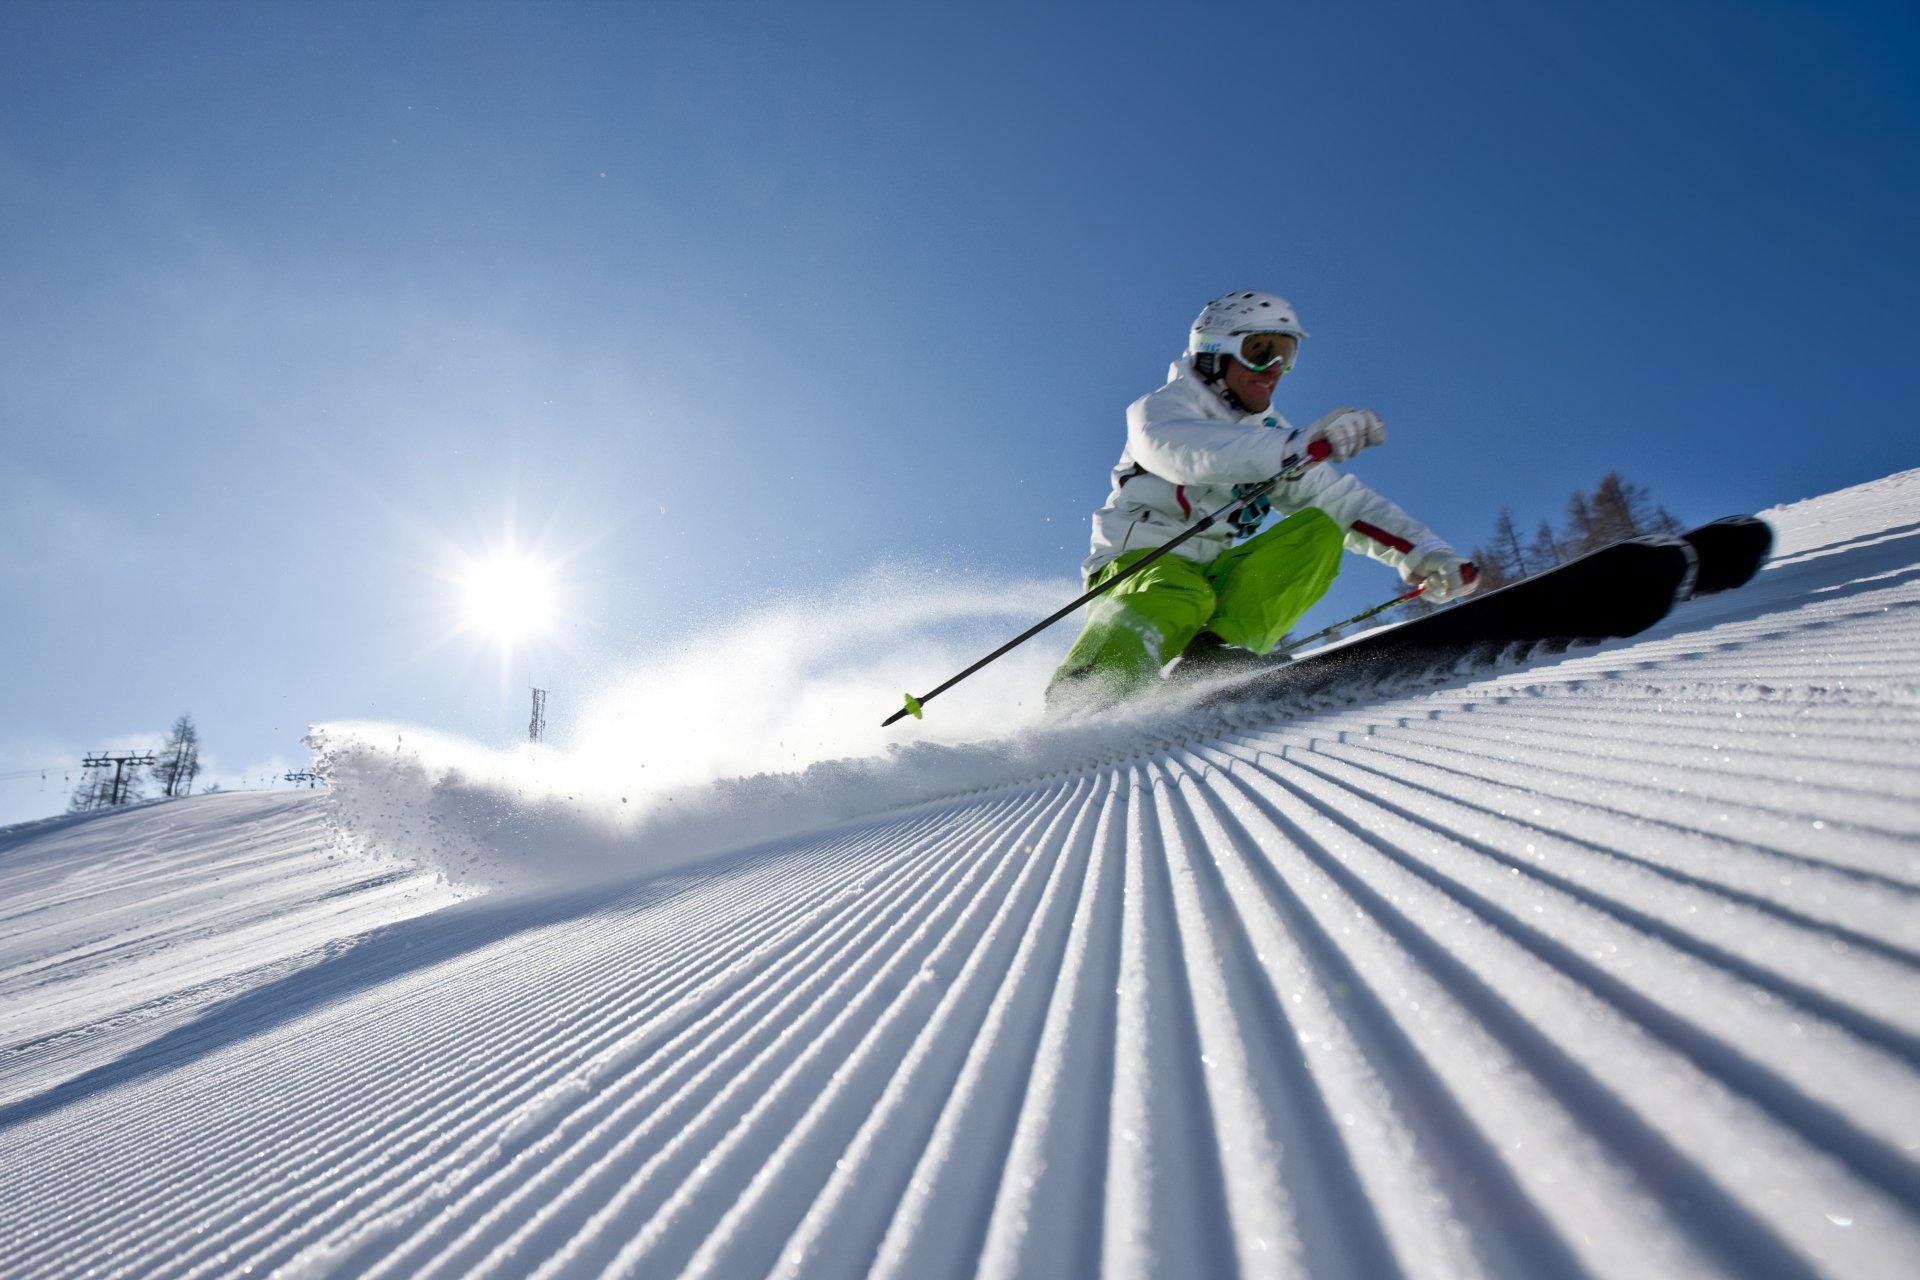 Ski resort val gardena italy wallpapers and images - Ski wallpaper ...